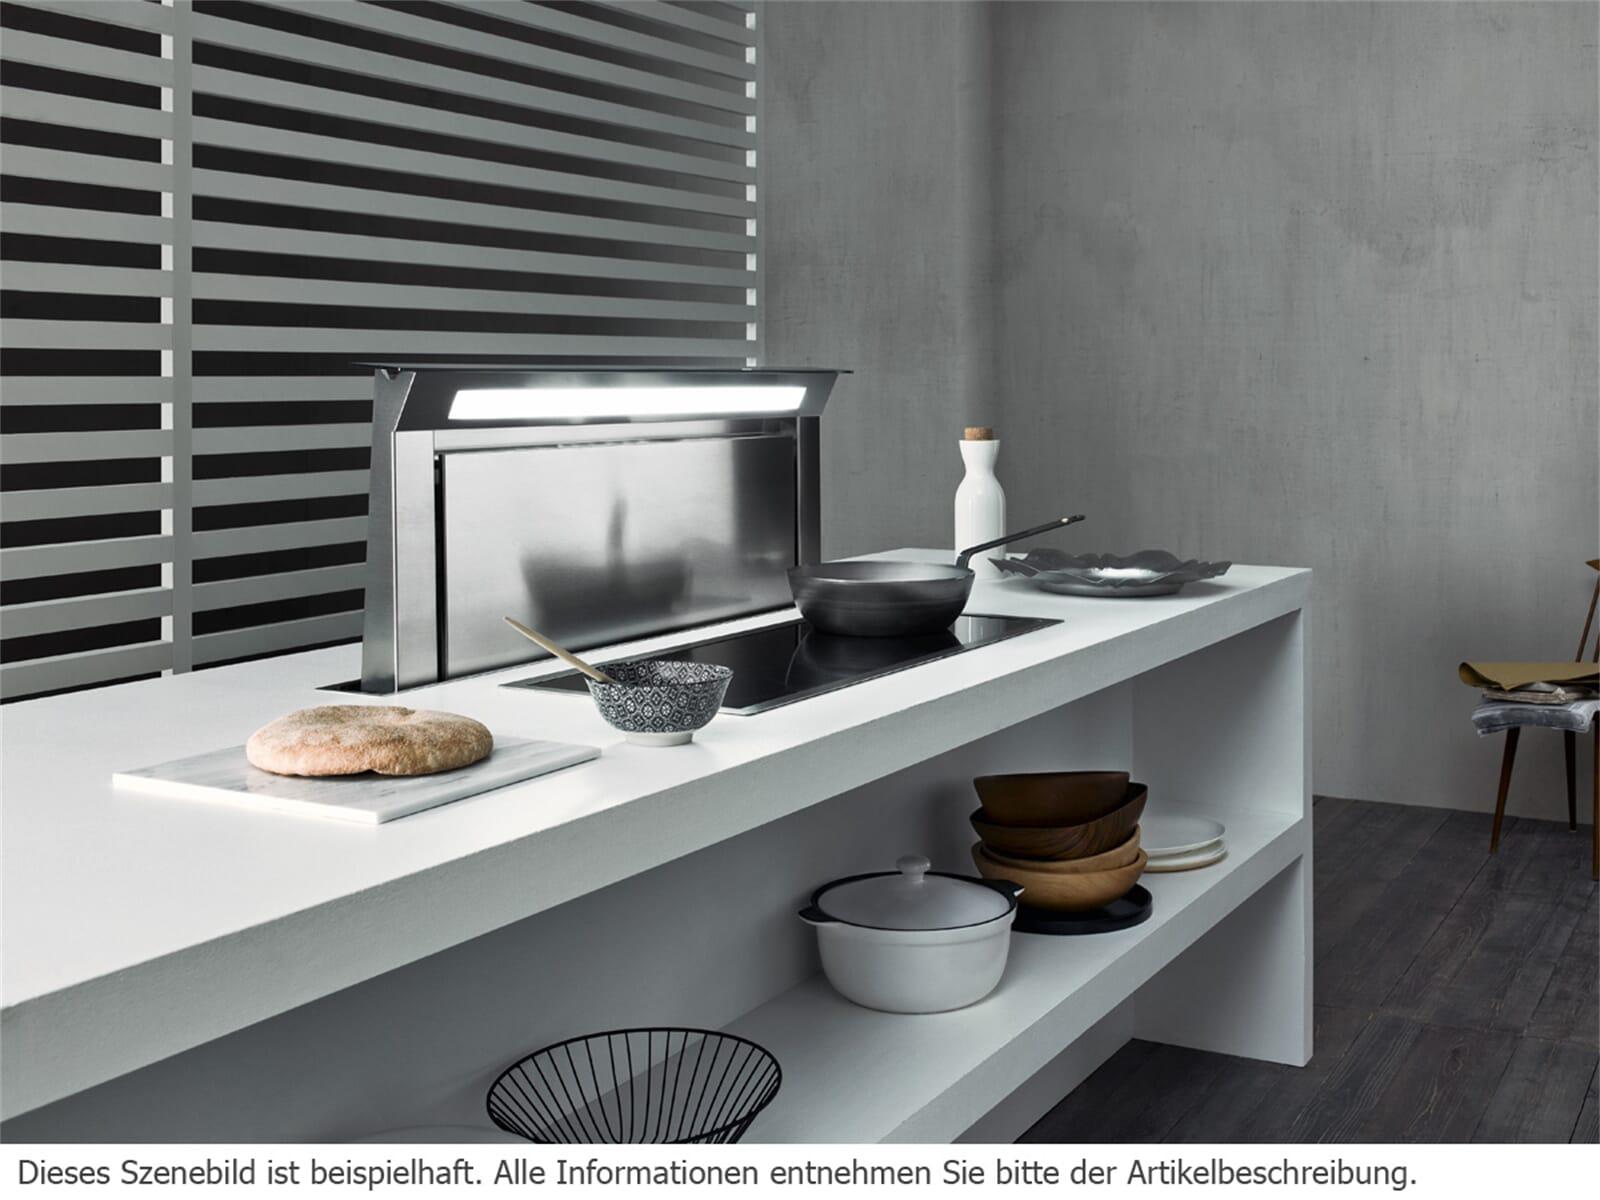 falmec downdraft. Black Bedroom Furniture Sets. Home Design Ideas